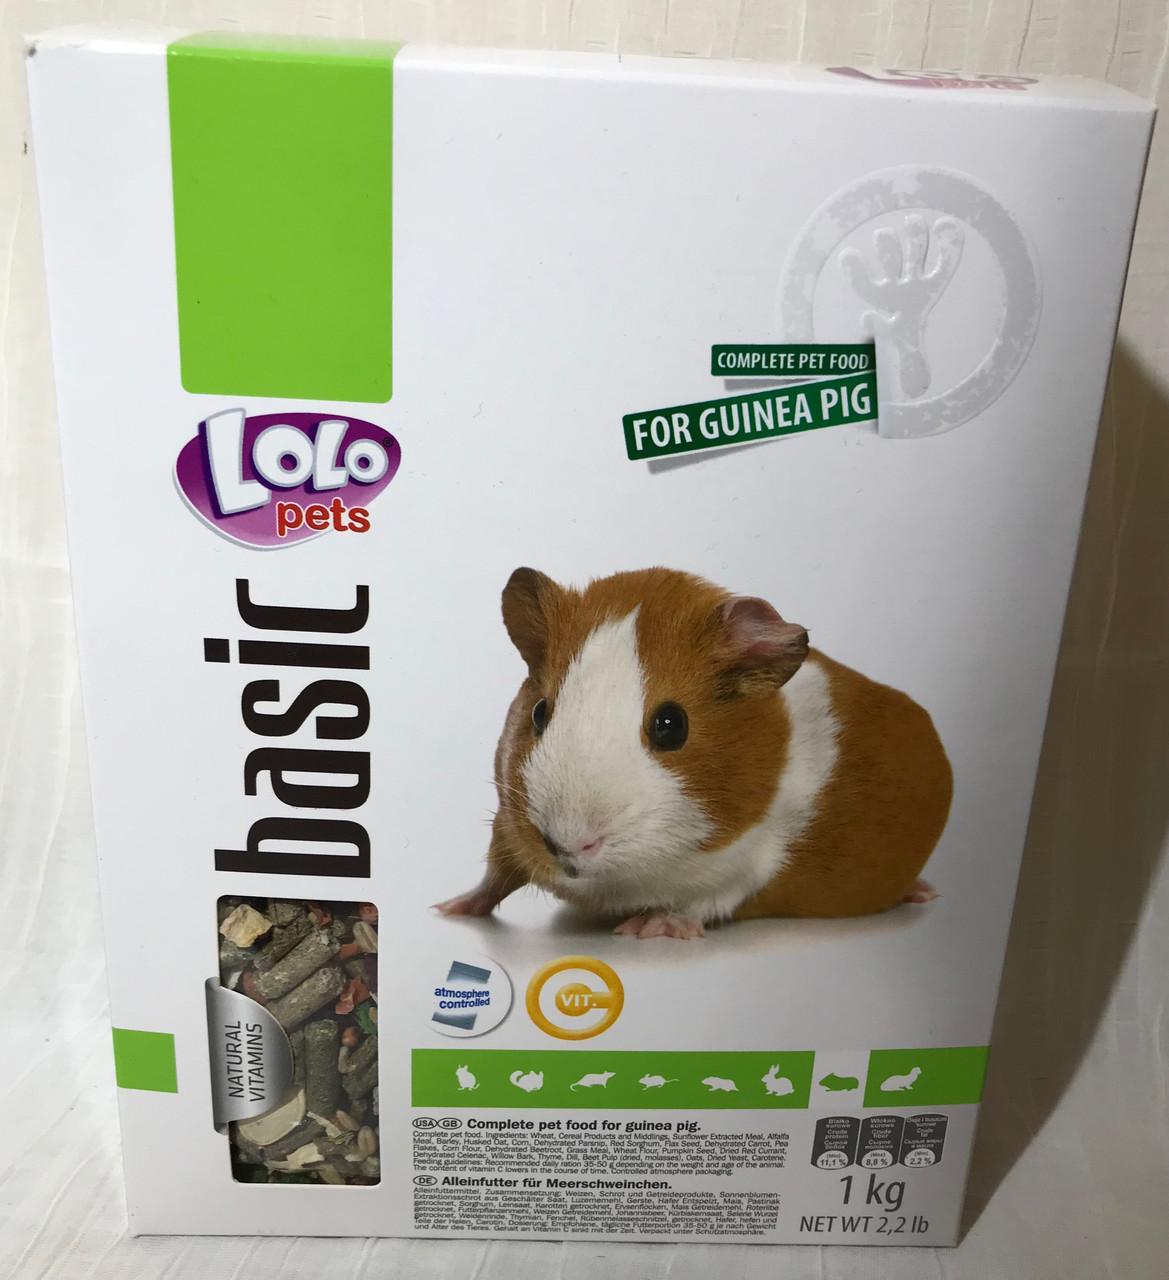 Полнорационный корм для морской свинки 1 кг Lolopets